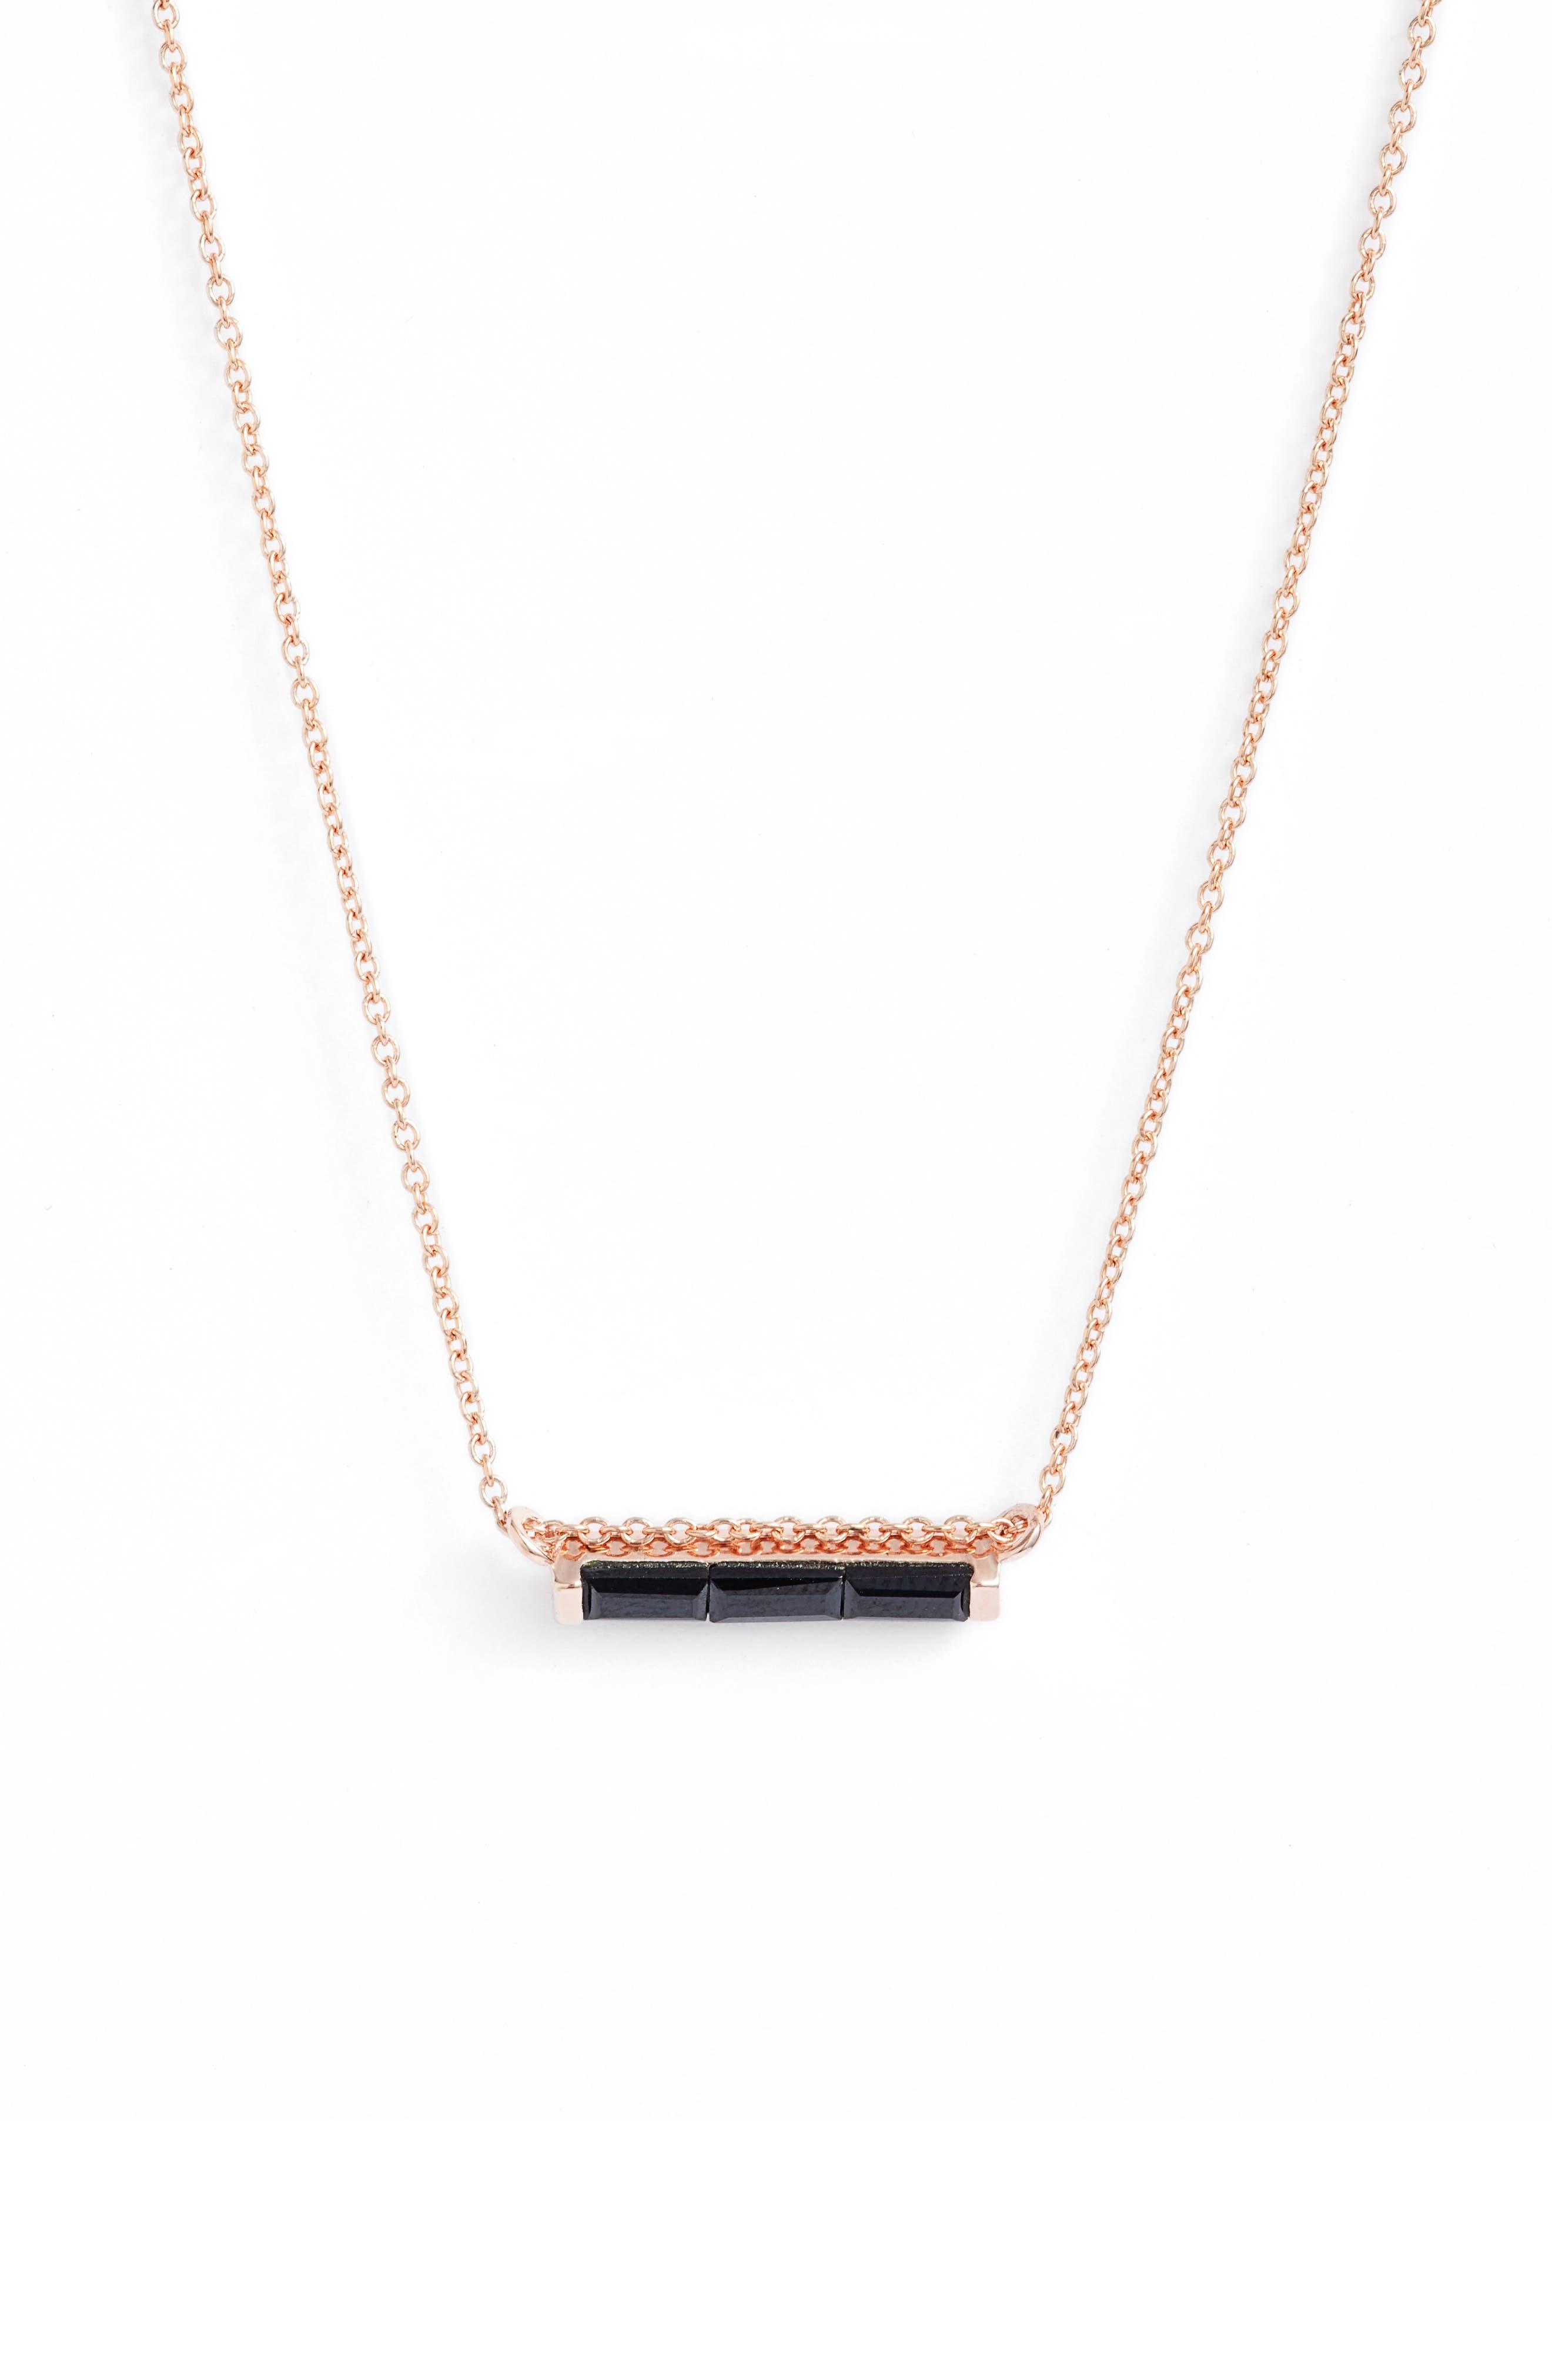 Leah Alexandra Channel Set Semiprecious Stone Necklace